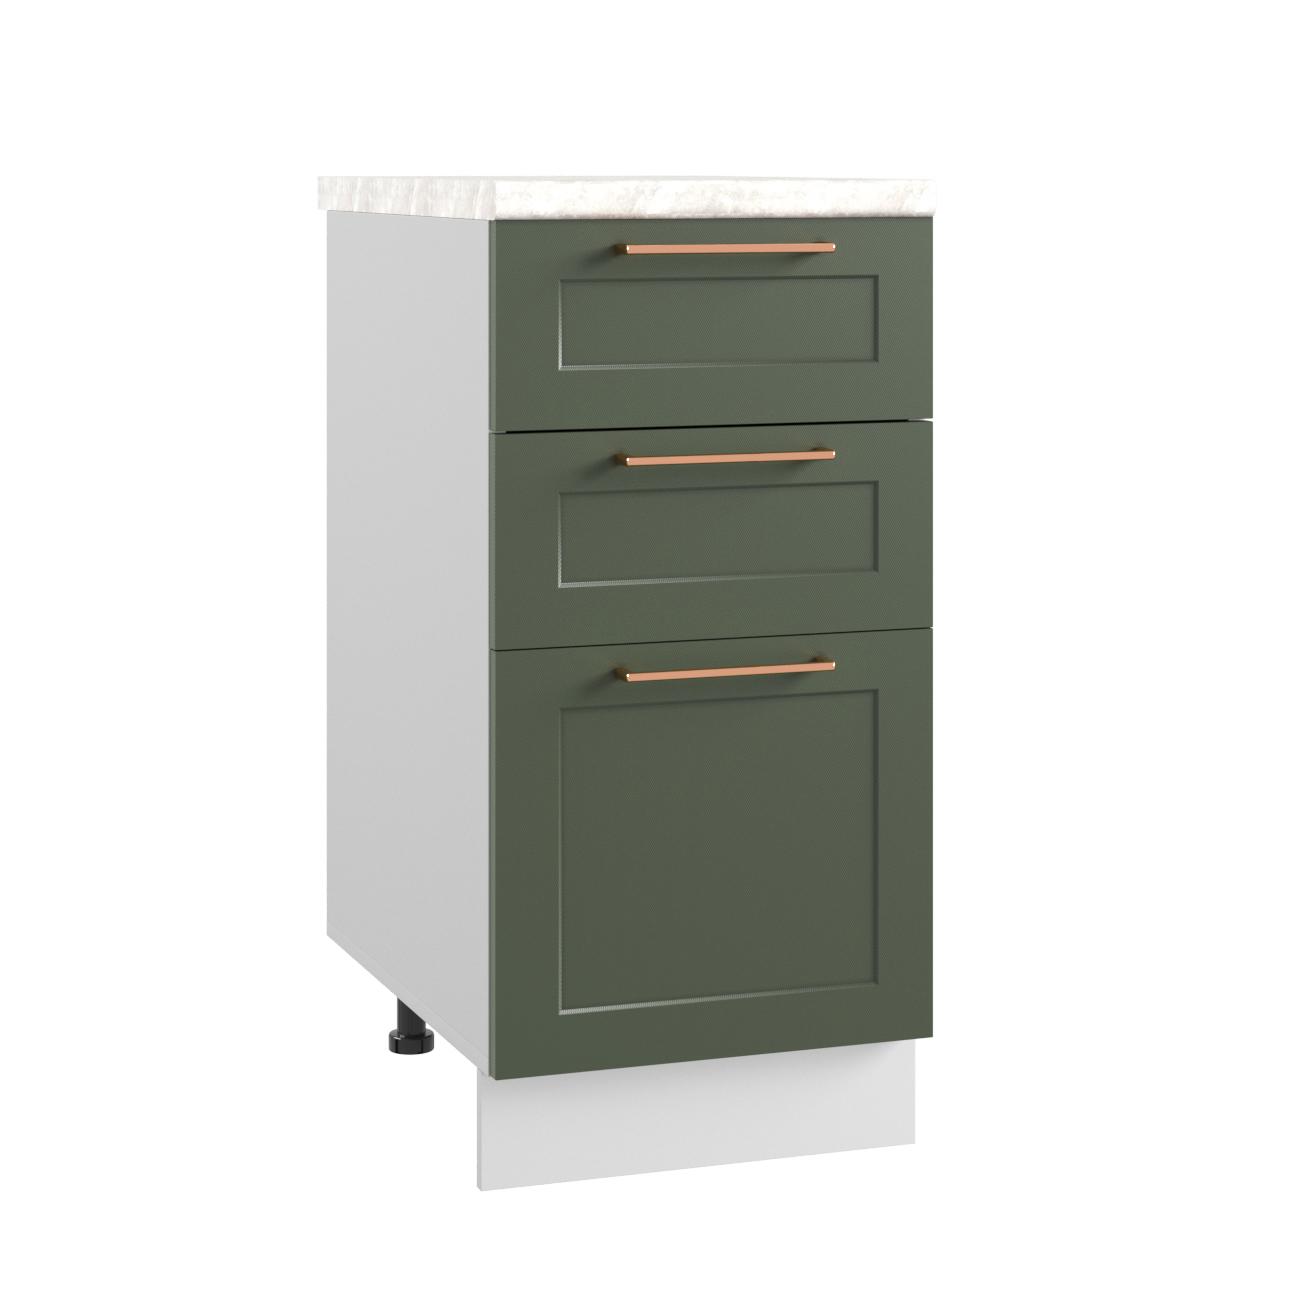 Кухня Квадро СЯ 400 Шкаф нижний с ящиками